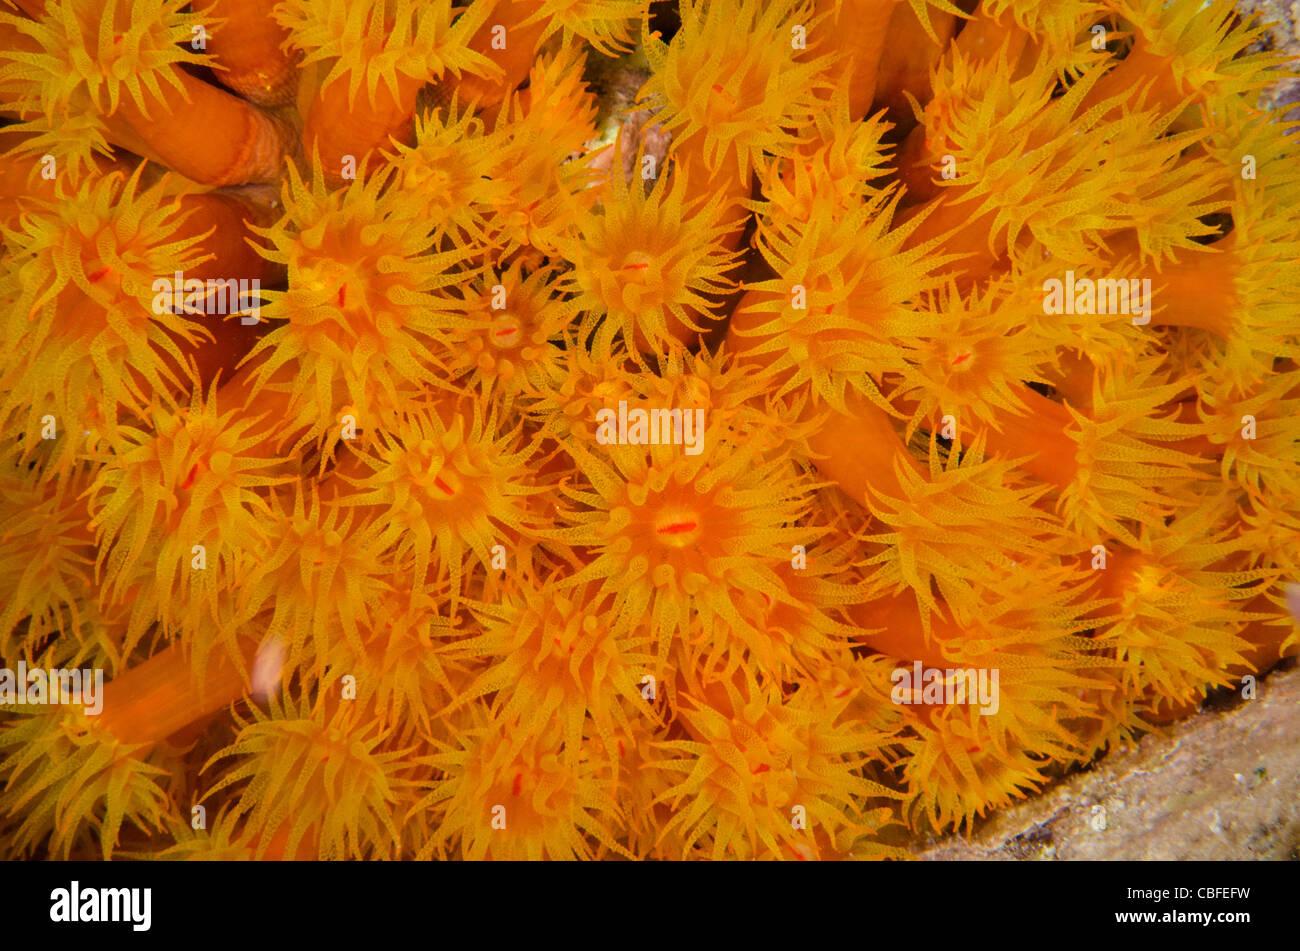 Orange Cup Coral (Tubastraea coccinea), Bonaire, Netherlands Antilles, Caribbean - Stock Image